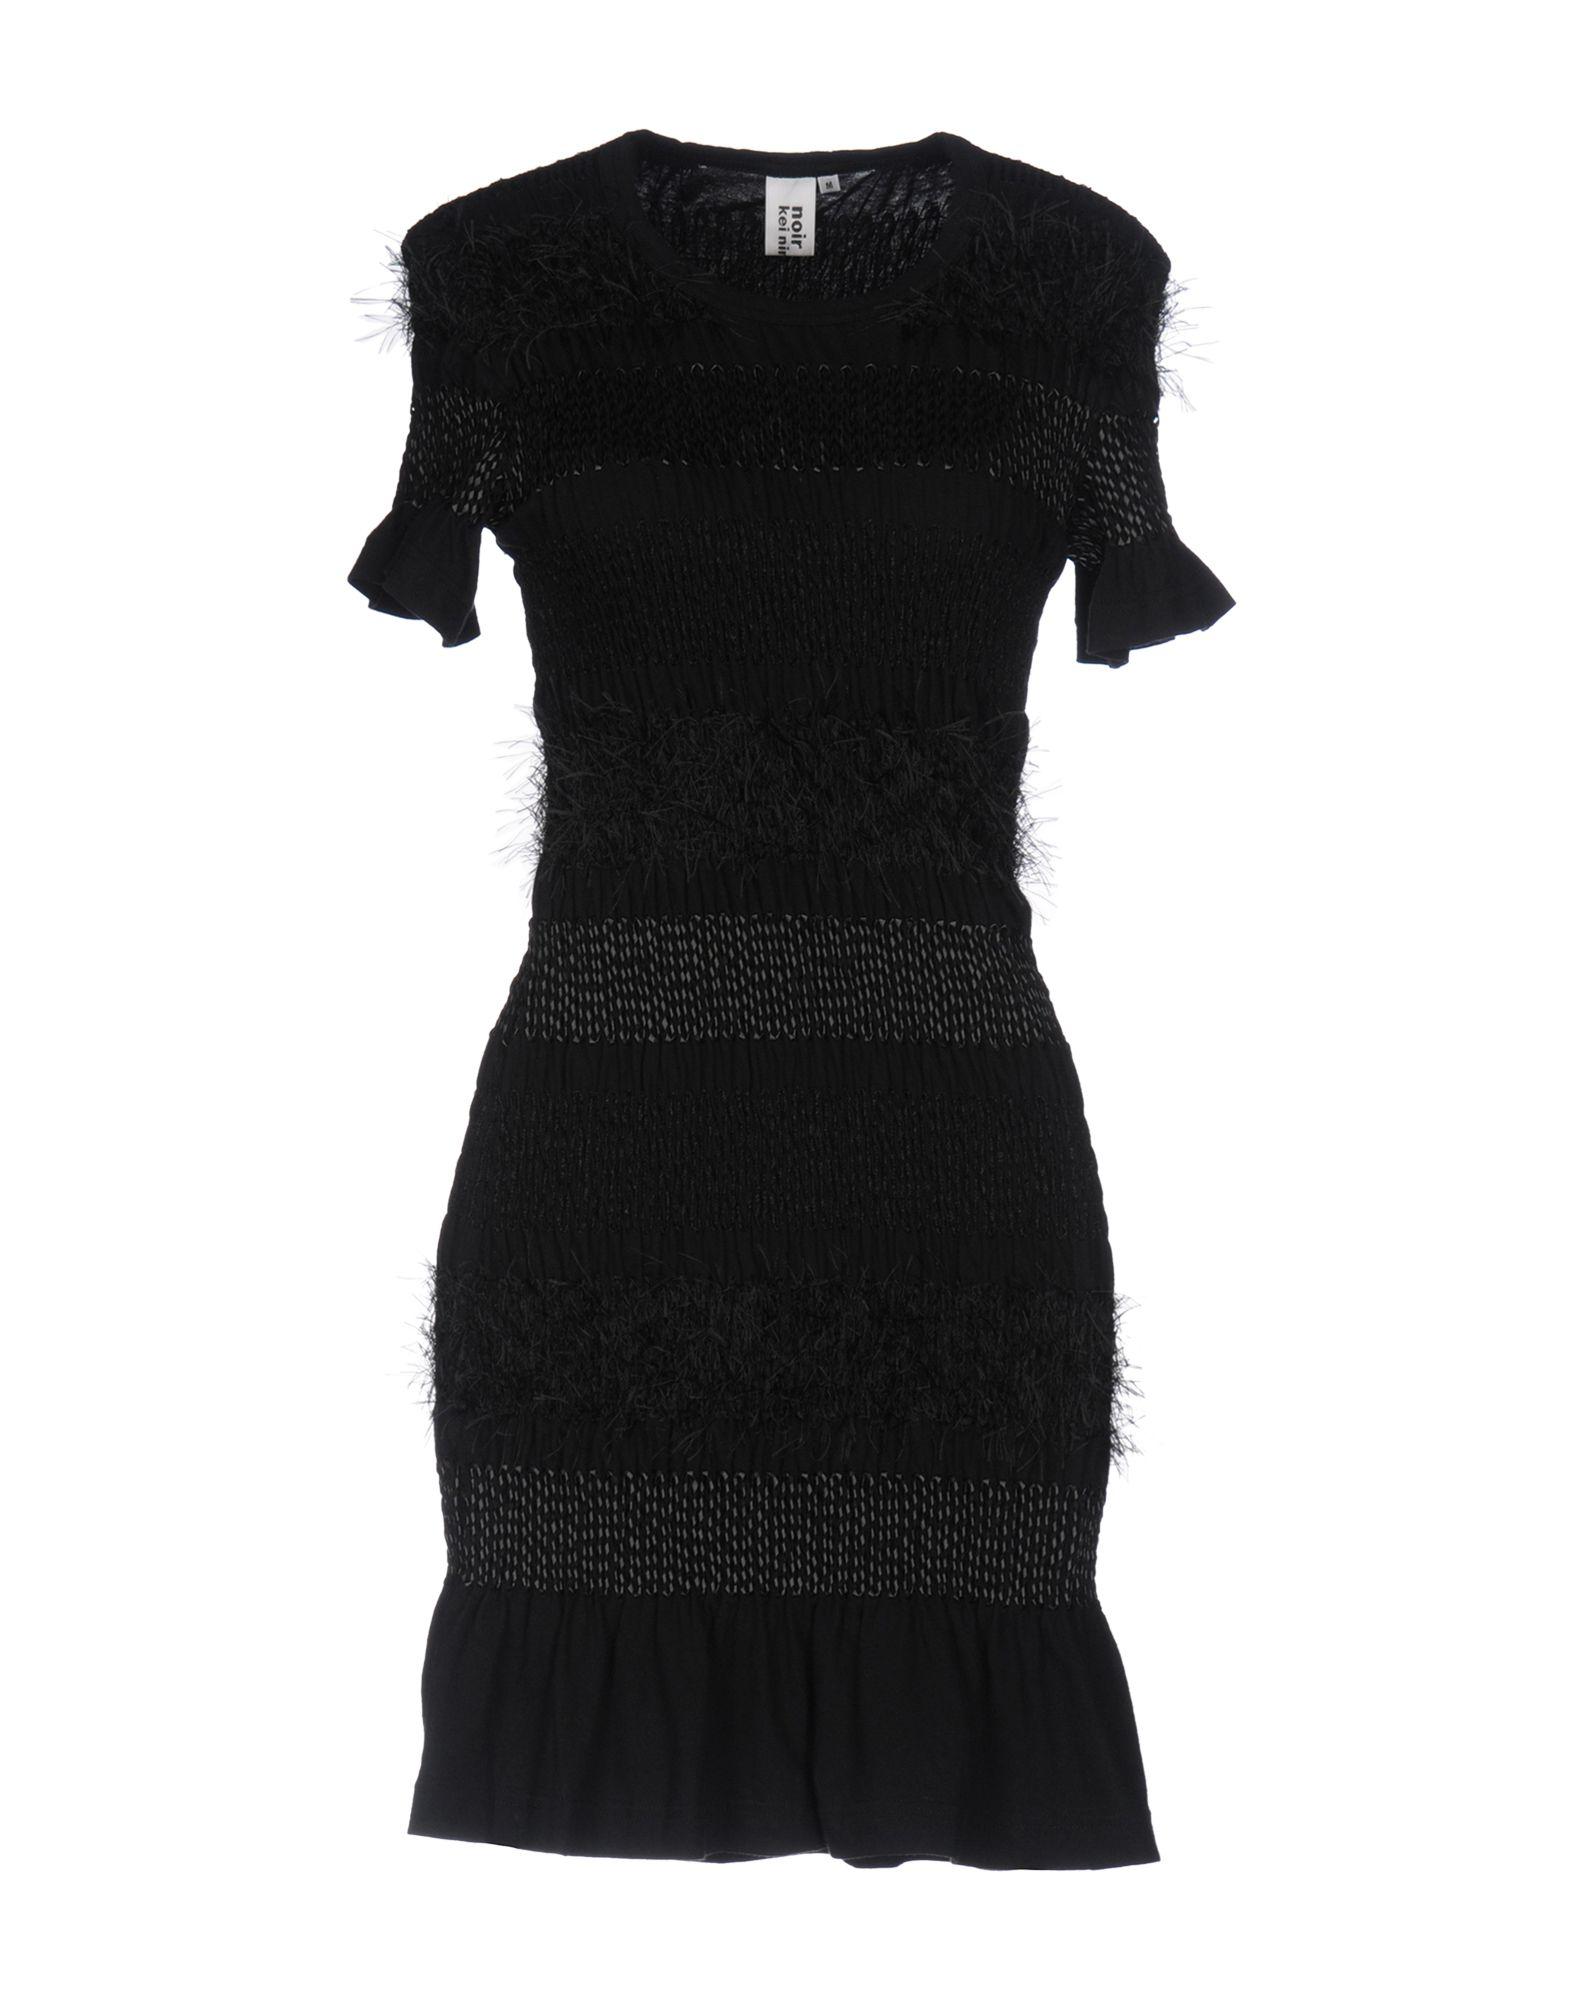 NOIR KEI NINOMIYA Короткое платье футболка supremebeing pantera noir ss14 black 8901 xl